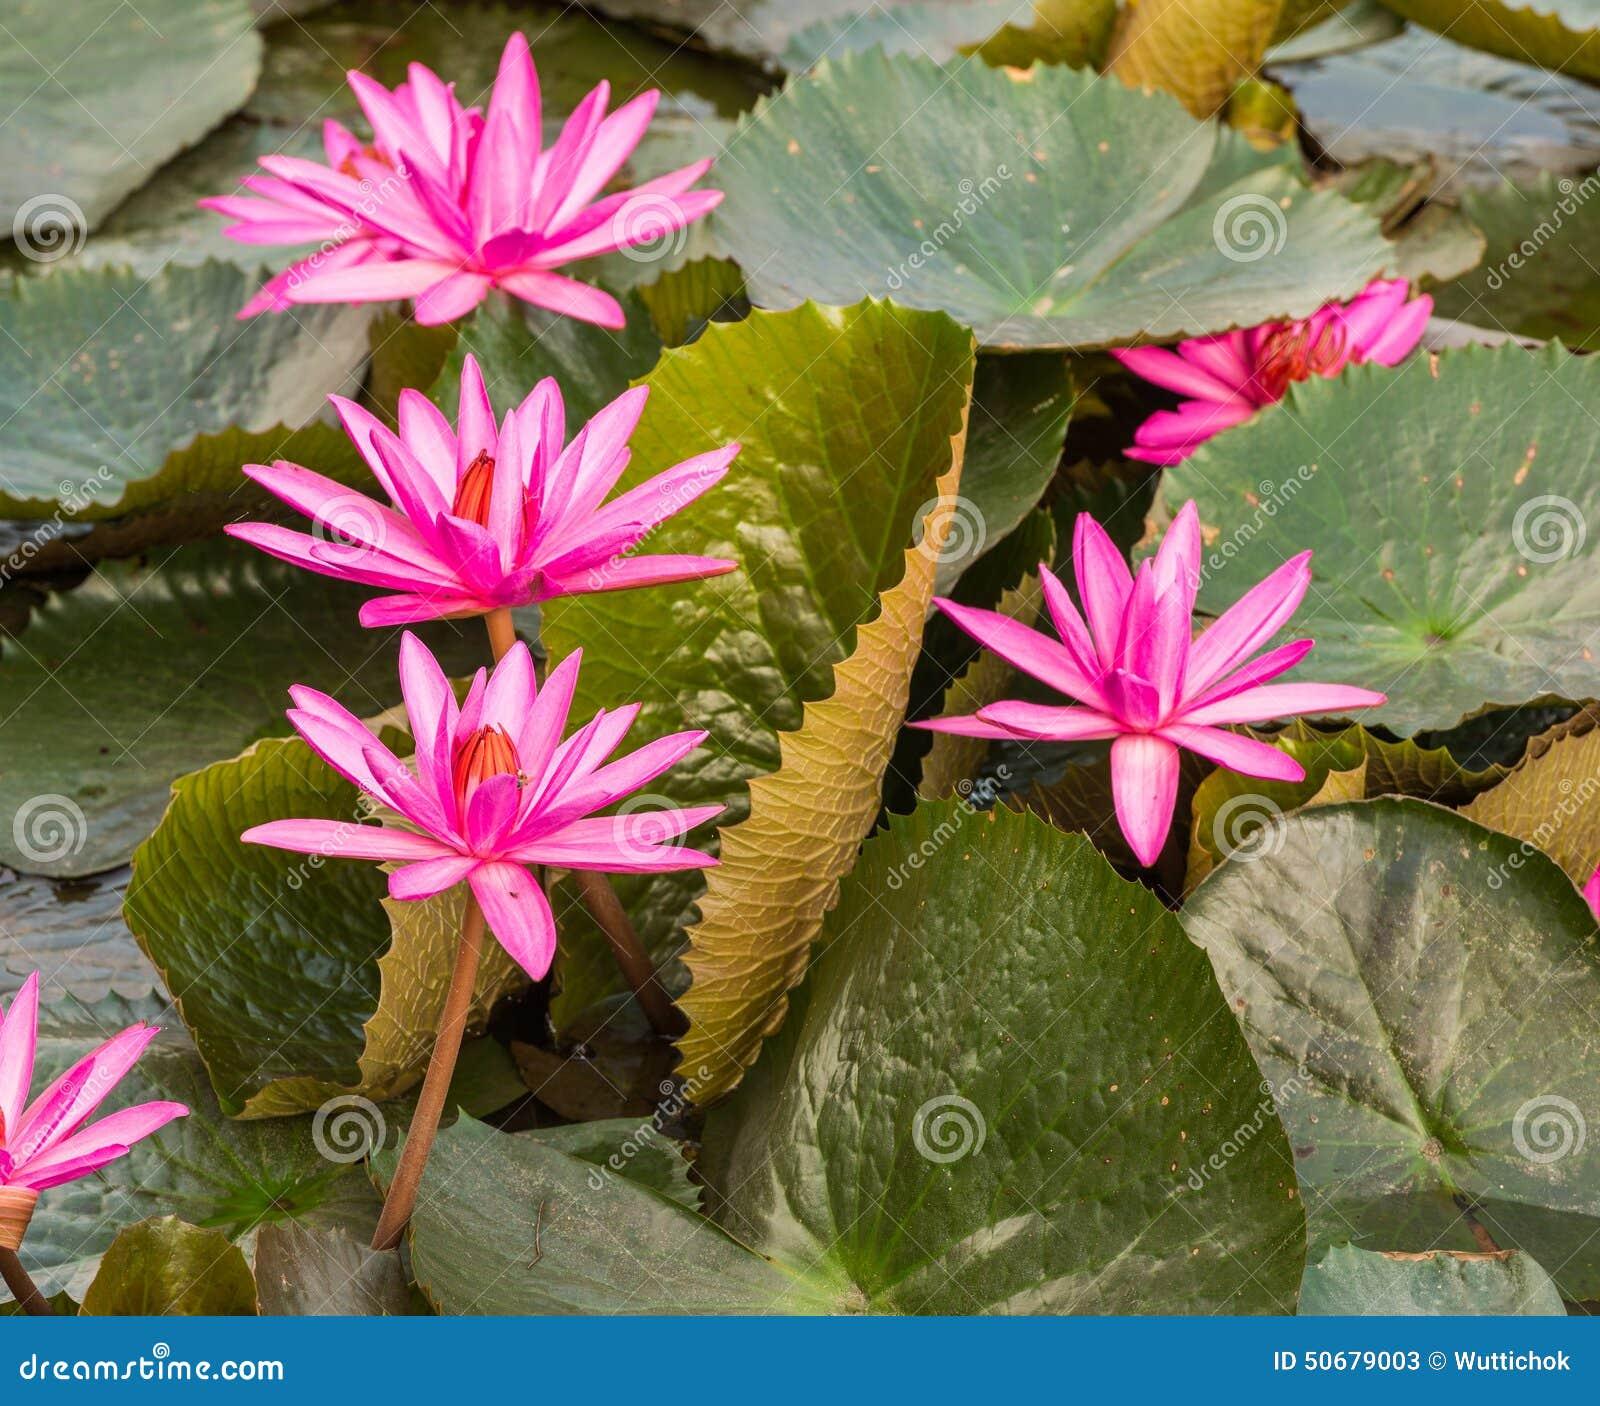 Pink Color Fresh Lotus Flower Blossom Stock Photo 50679003 Megapixl